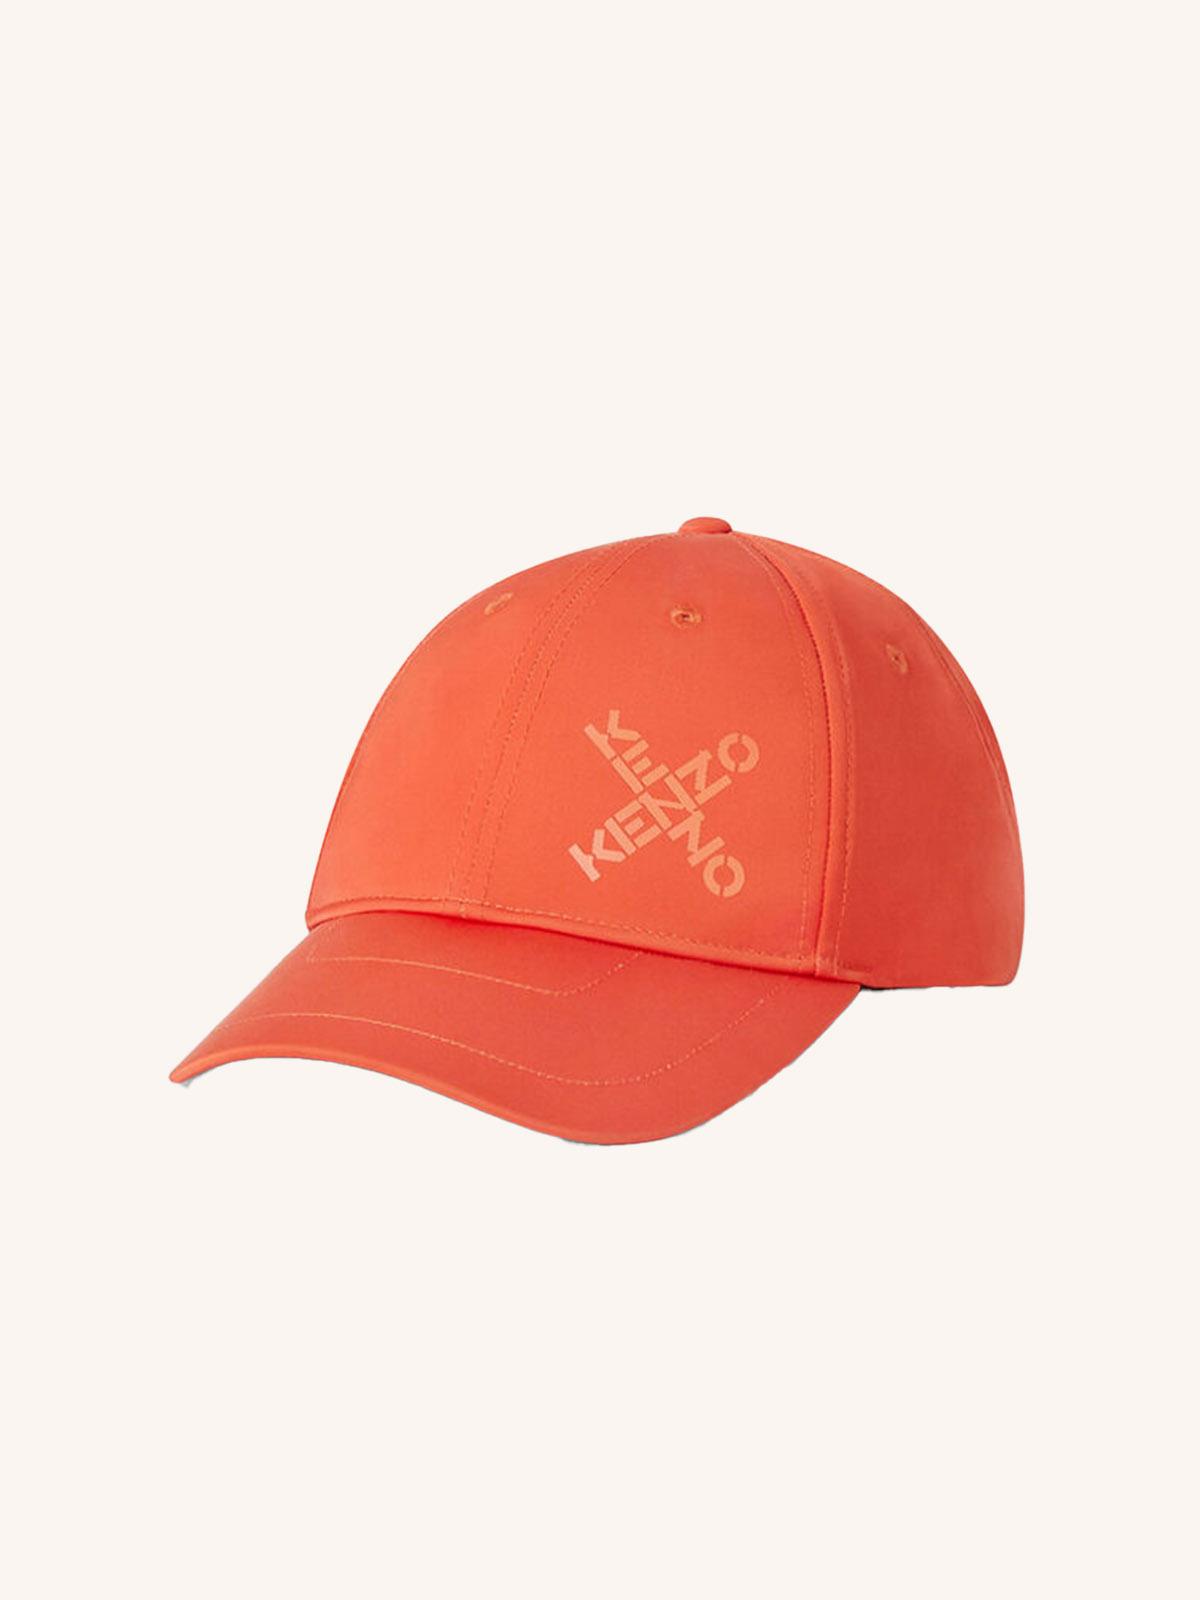 Kenzo - KENZO Sport 'Little X' baseball cap